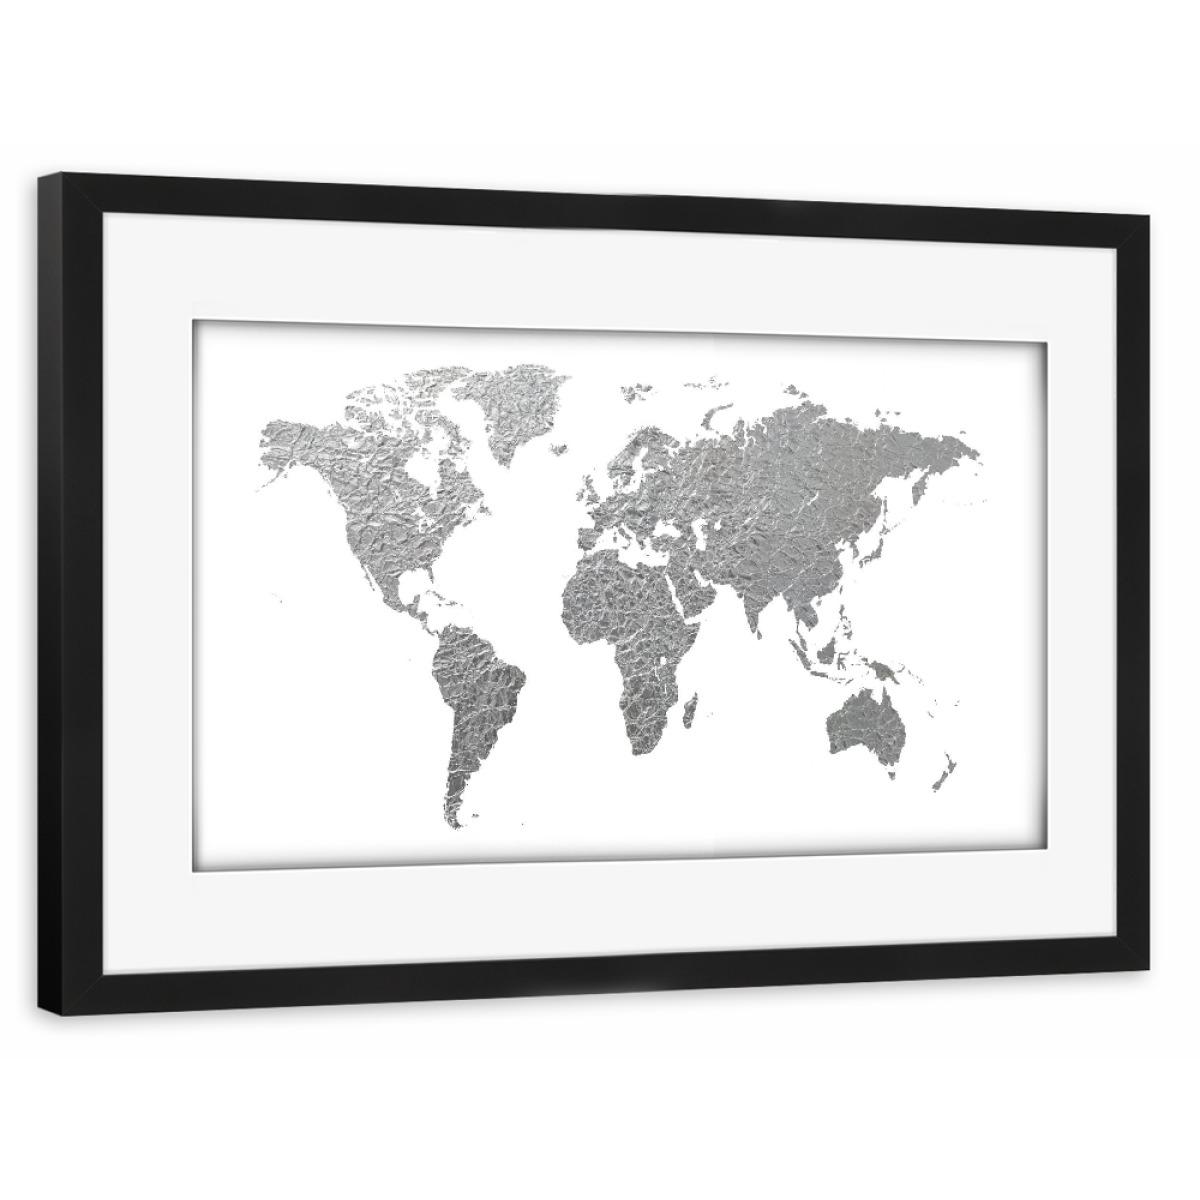 Wandfarbe Farbpalette Toom Eine Graue Farbpalette: World Map Silver Foil Als Gerahmt Bei ArtboxONE Kaufen